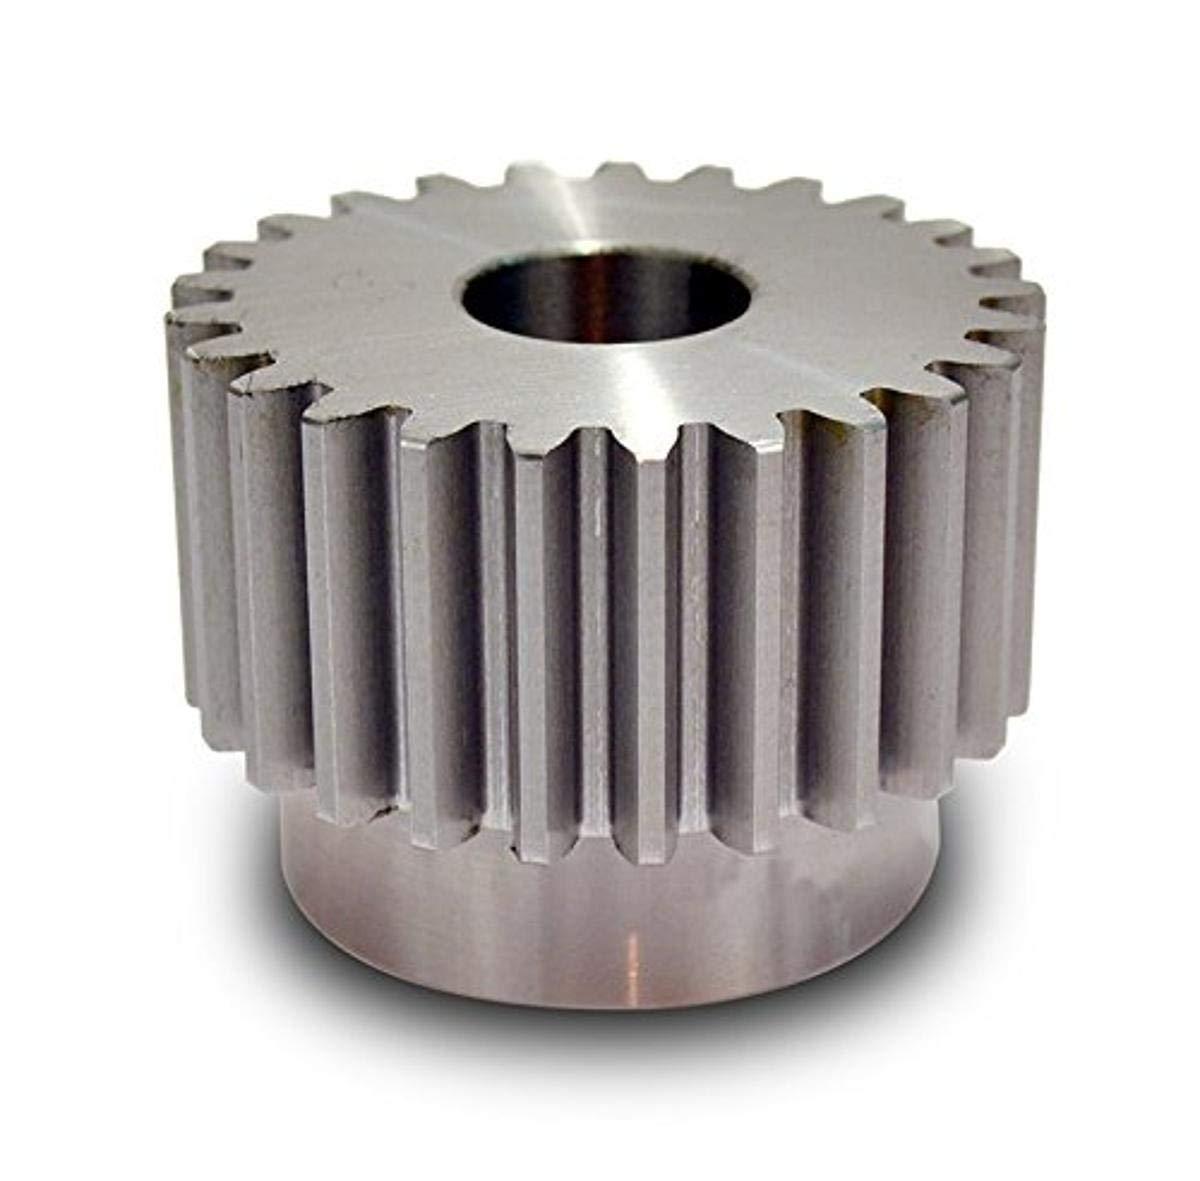 Boston Gear YF201 Max 62% OFF Spur Regular store Steel Inch Bore 10 1.000